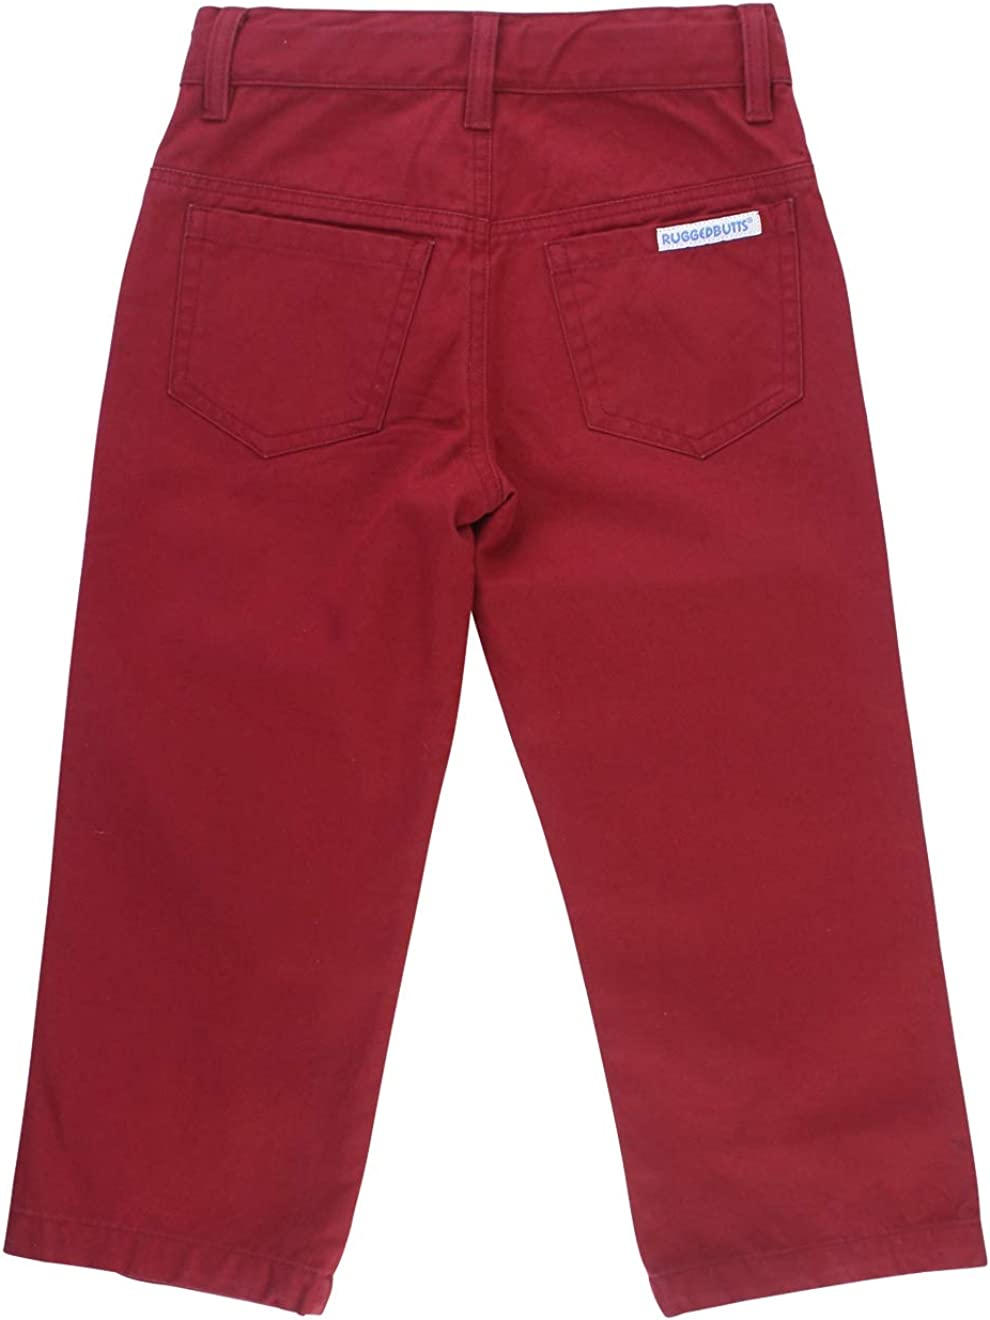 RuggedButts Boys Chino Pants